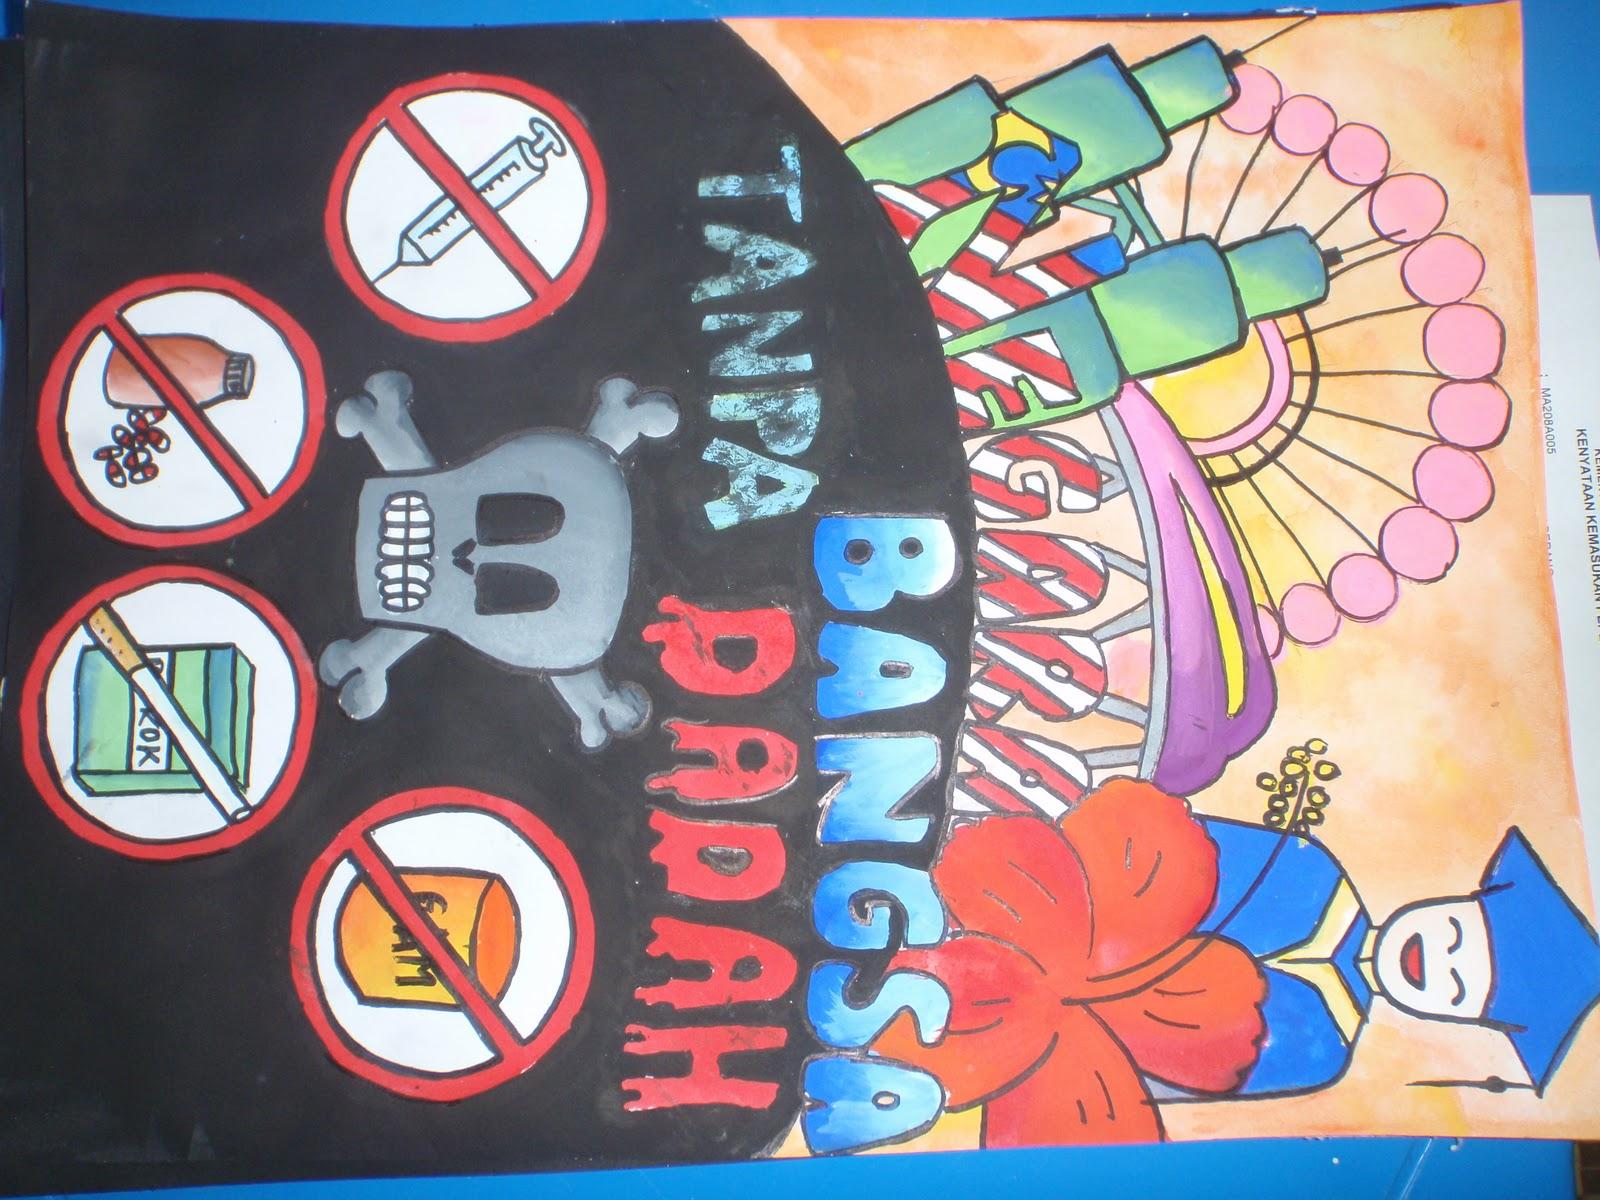 Contoh Gambar Lukisan Poster Anti Dadah Dev Gaol